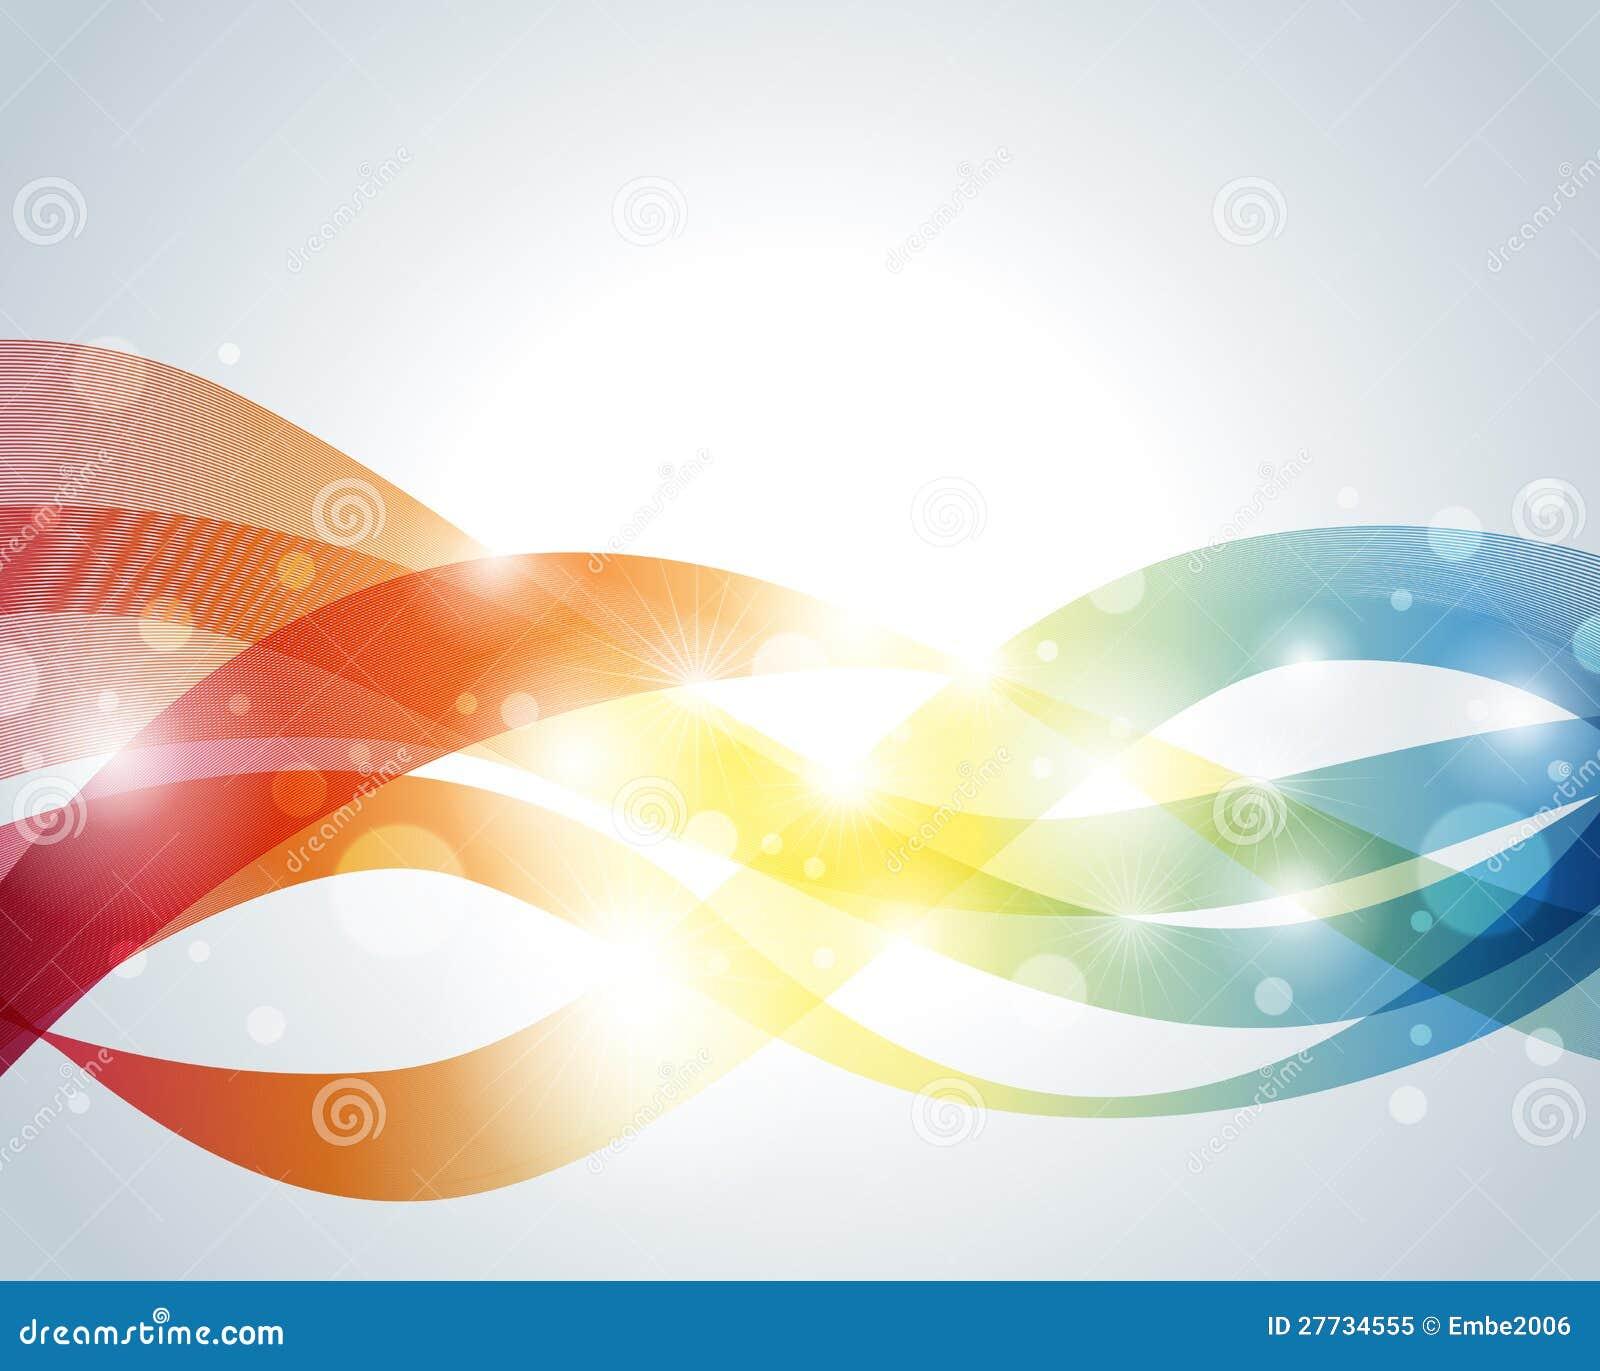 Wellenförmiger abstrakter Hintergrund